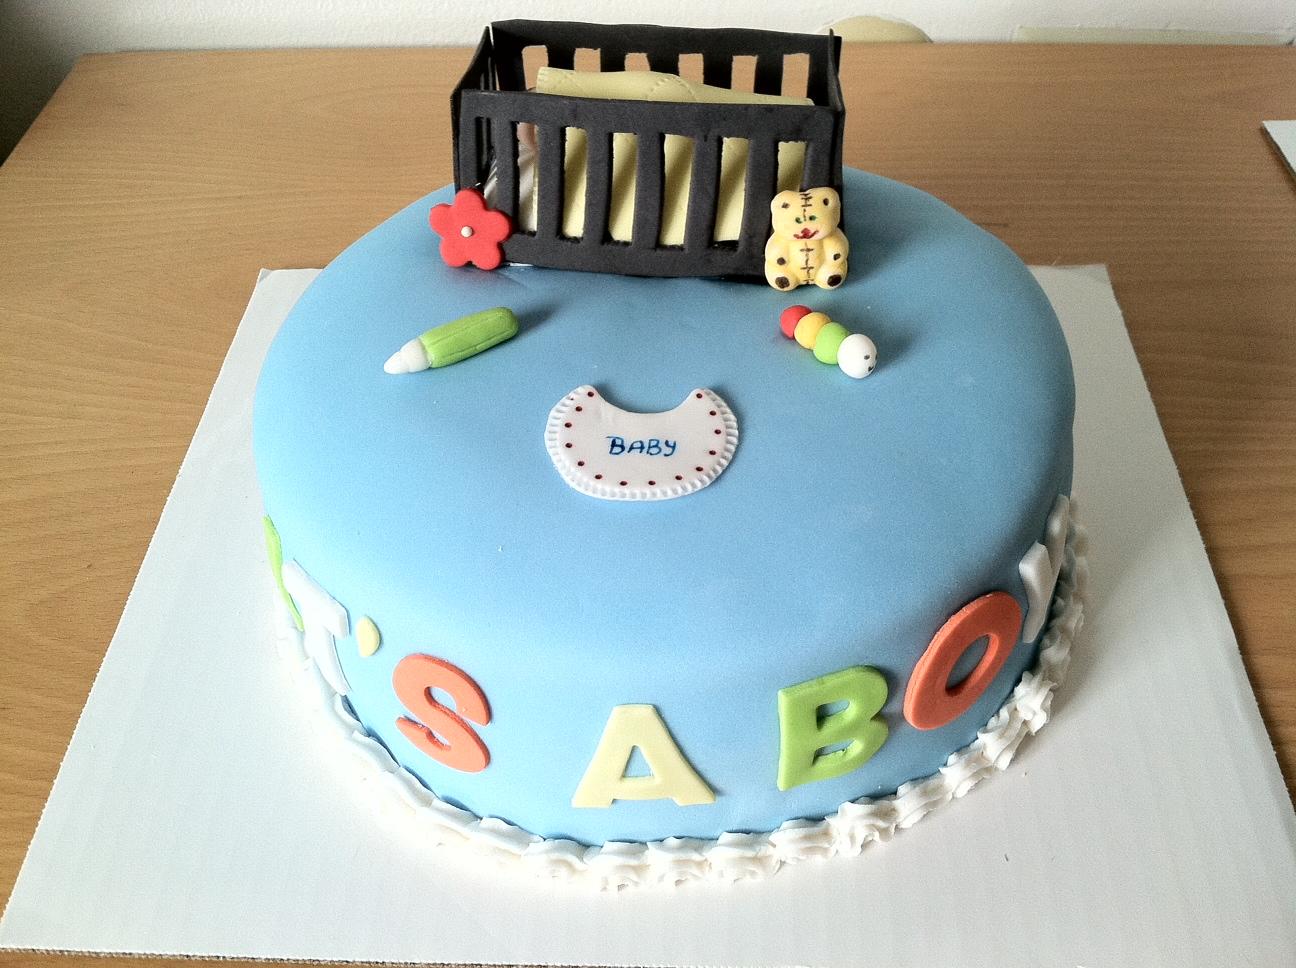 Baby Shower Cakes: Baby Boy Shower Cake Decorating Ideas